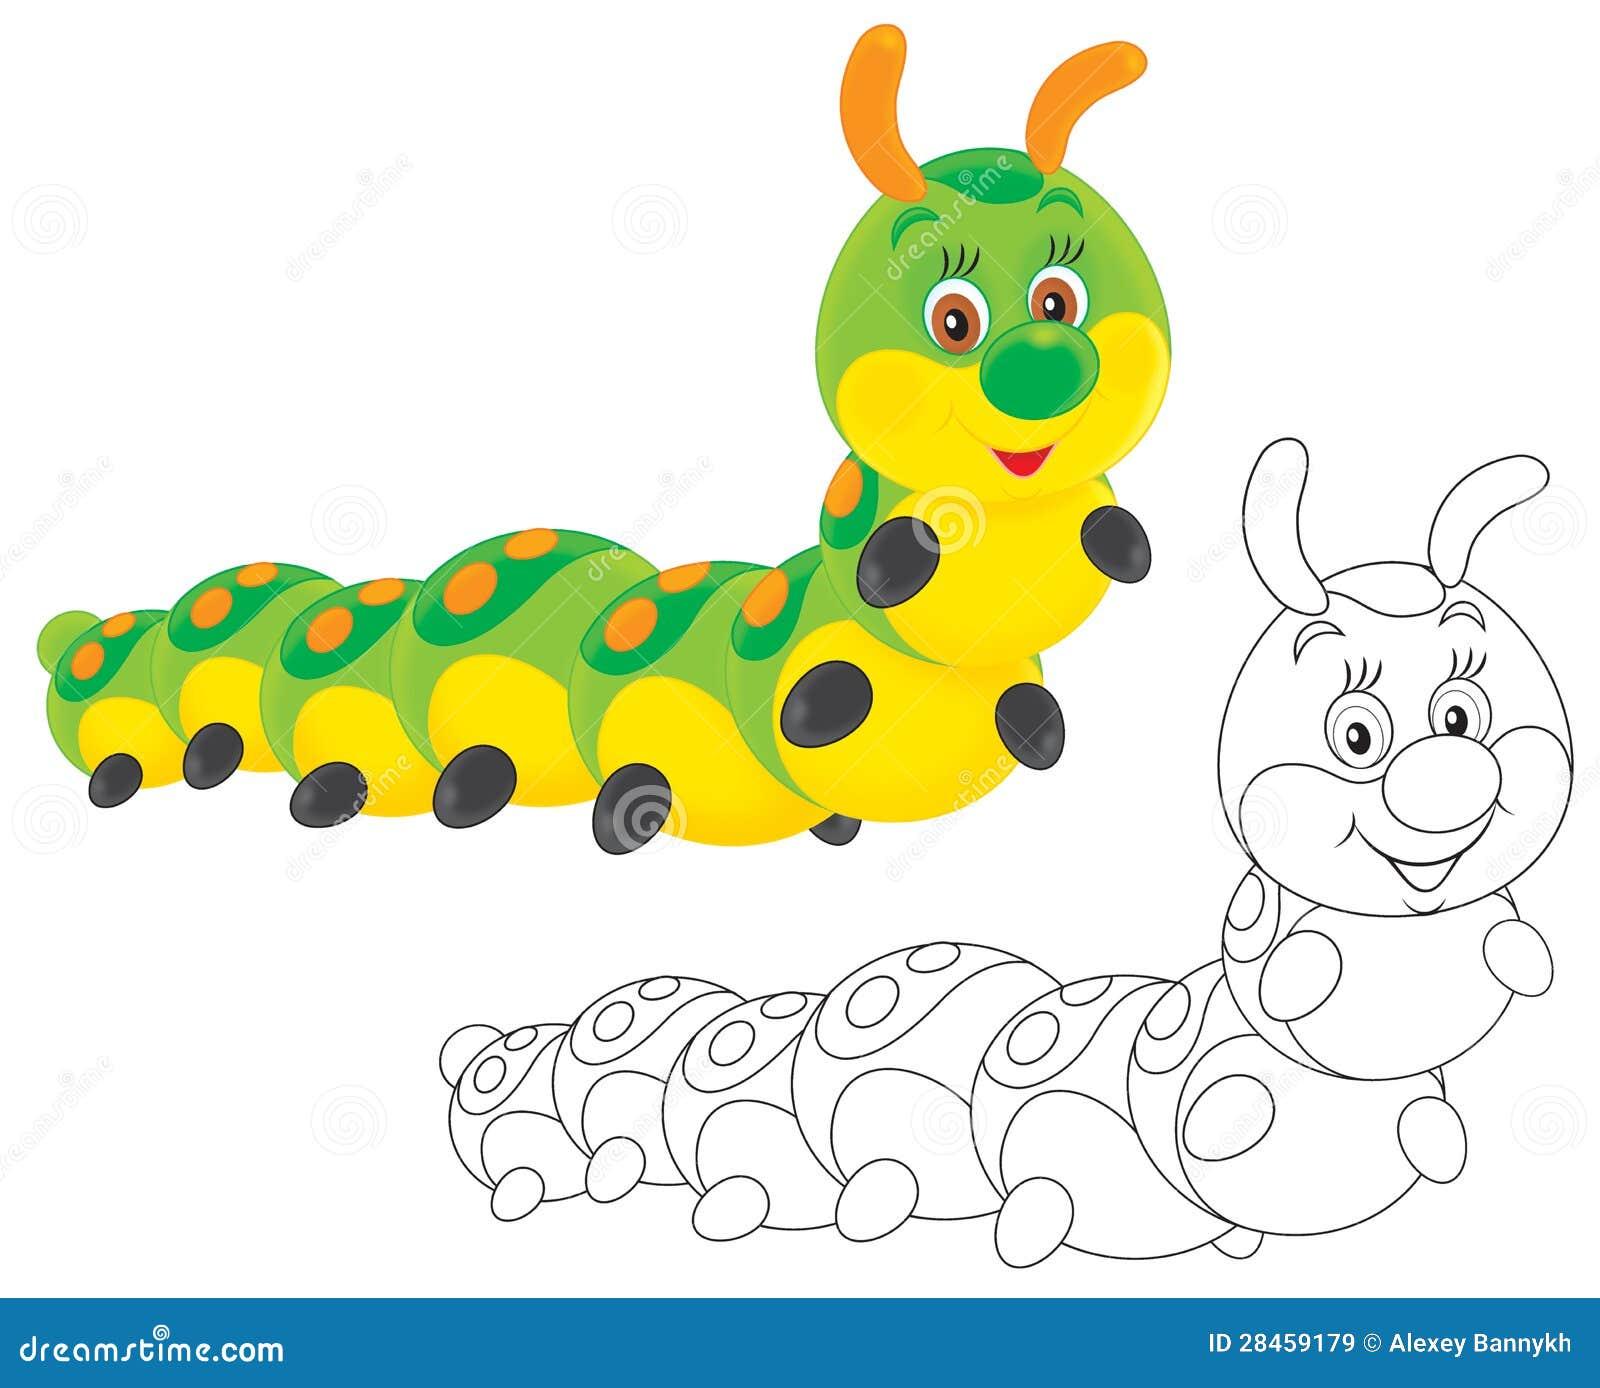 Caterpillar stock illustration. Illustration of cartoon ... Гусеница Вектор